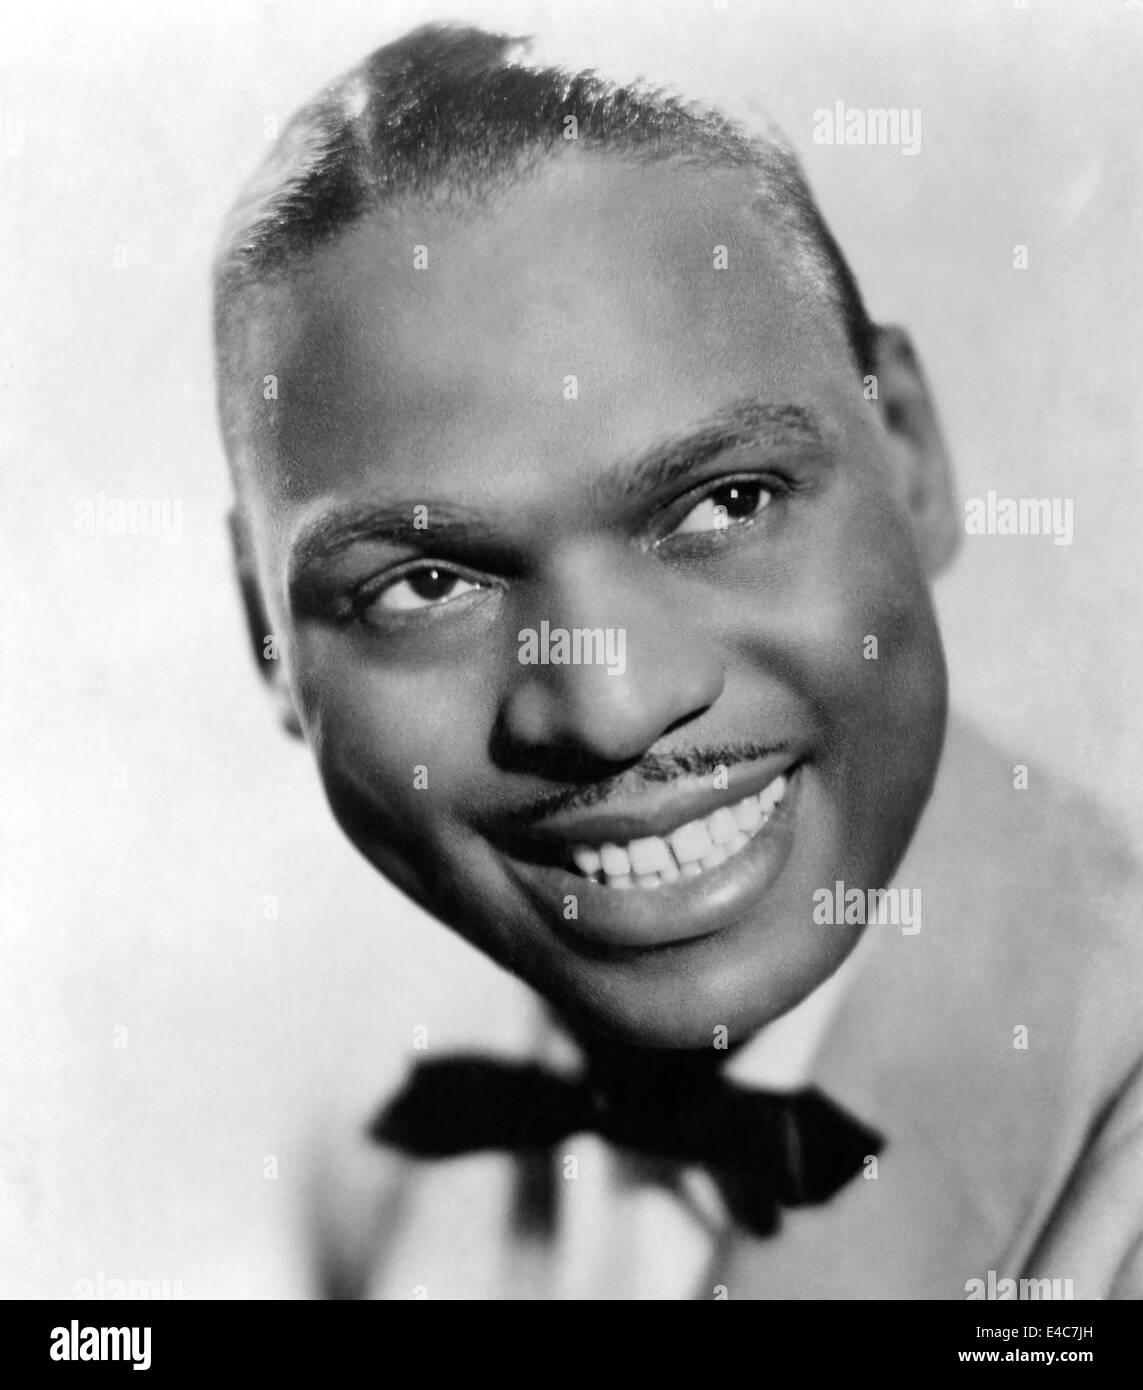 Earl Hines, Jazz Pianist, Portrait, circa 1950's - Stock Image